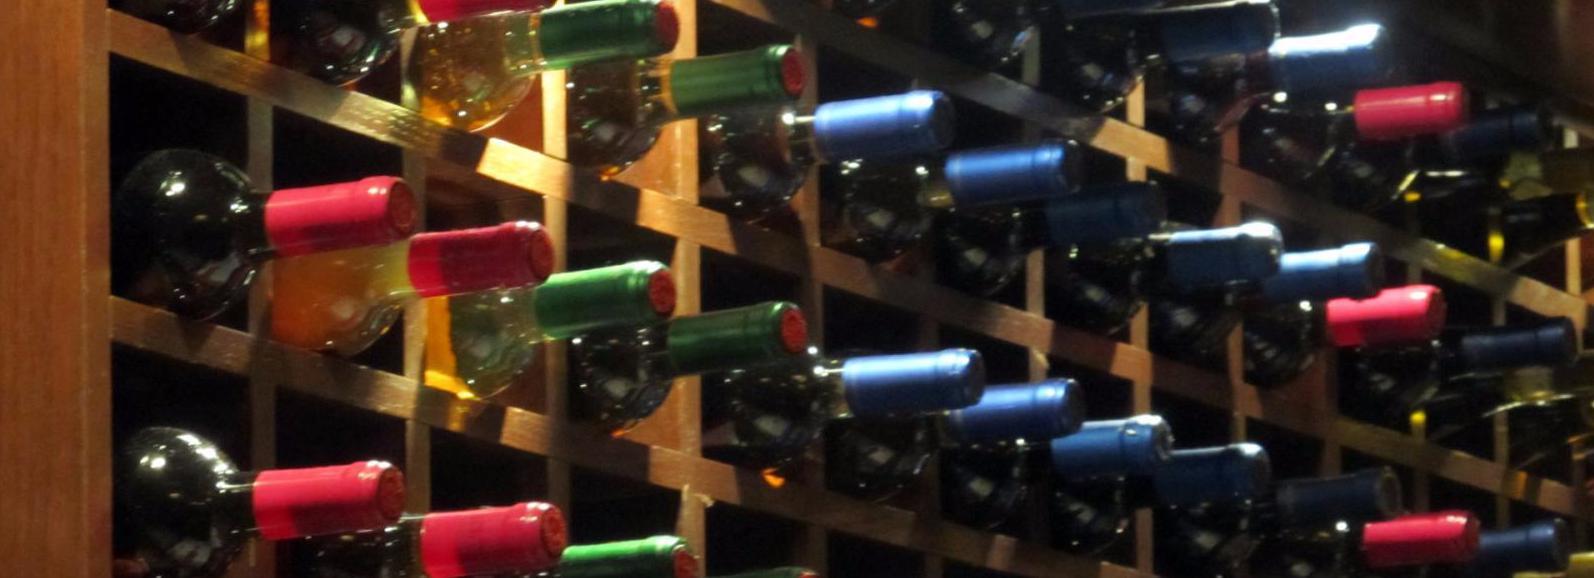 The American Institute of Wine & Food